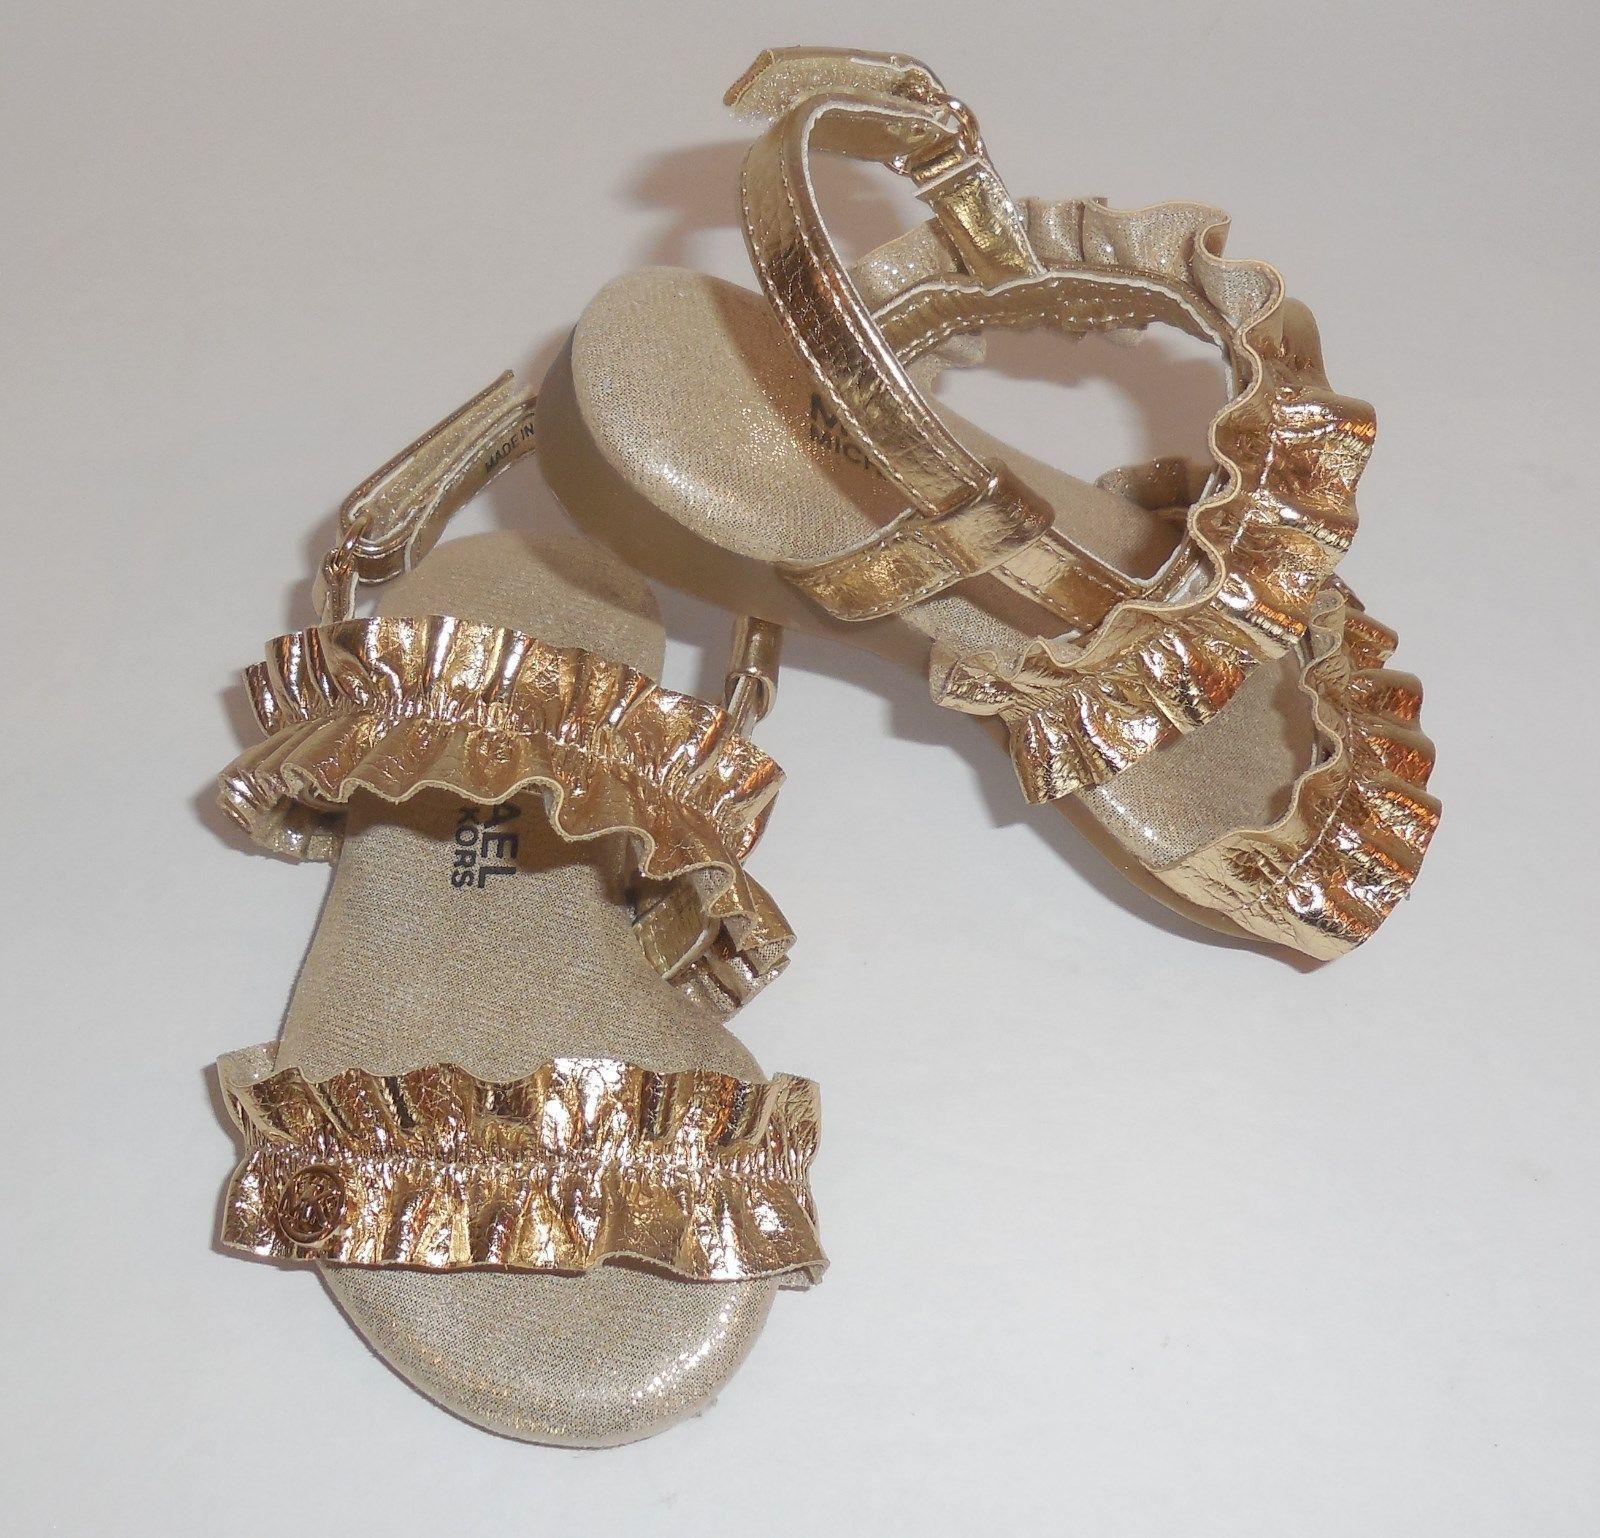 04f542b1ef Michael Kors Girls 8 Toddler Demi Frillz T-888 Gold Sandals Shoes Ruffles  New